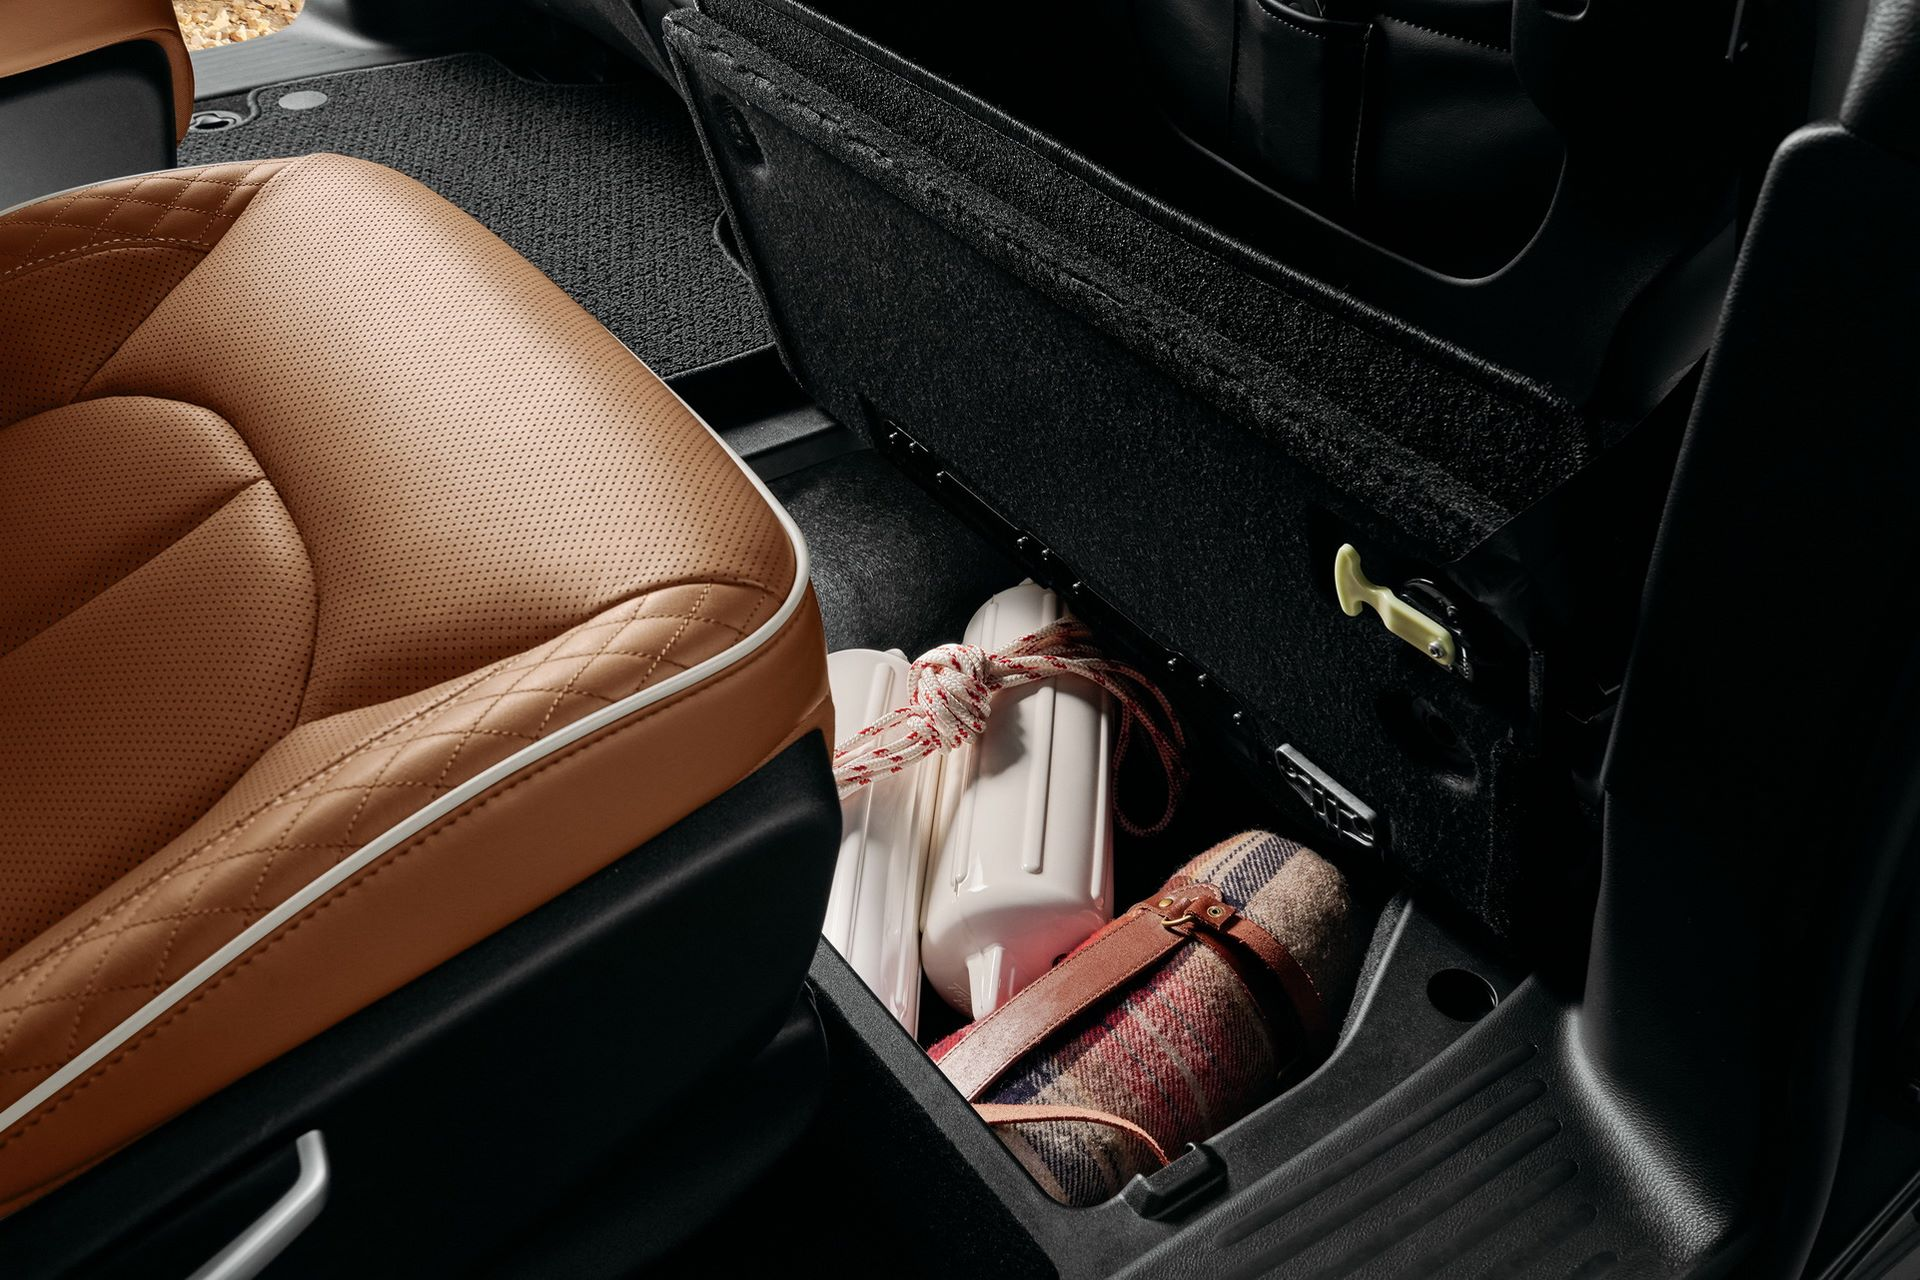 2021-Chrysler-Pacifica-44